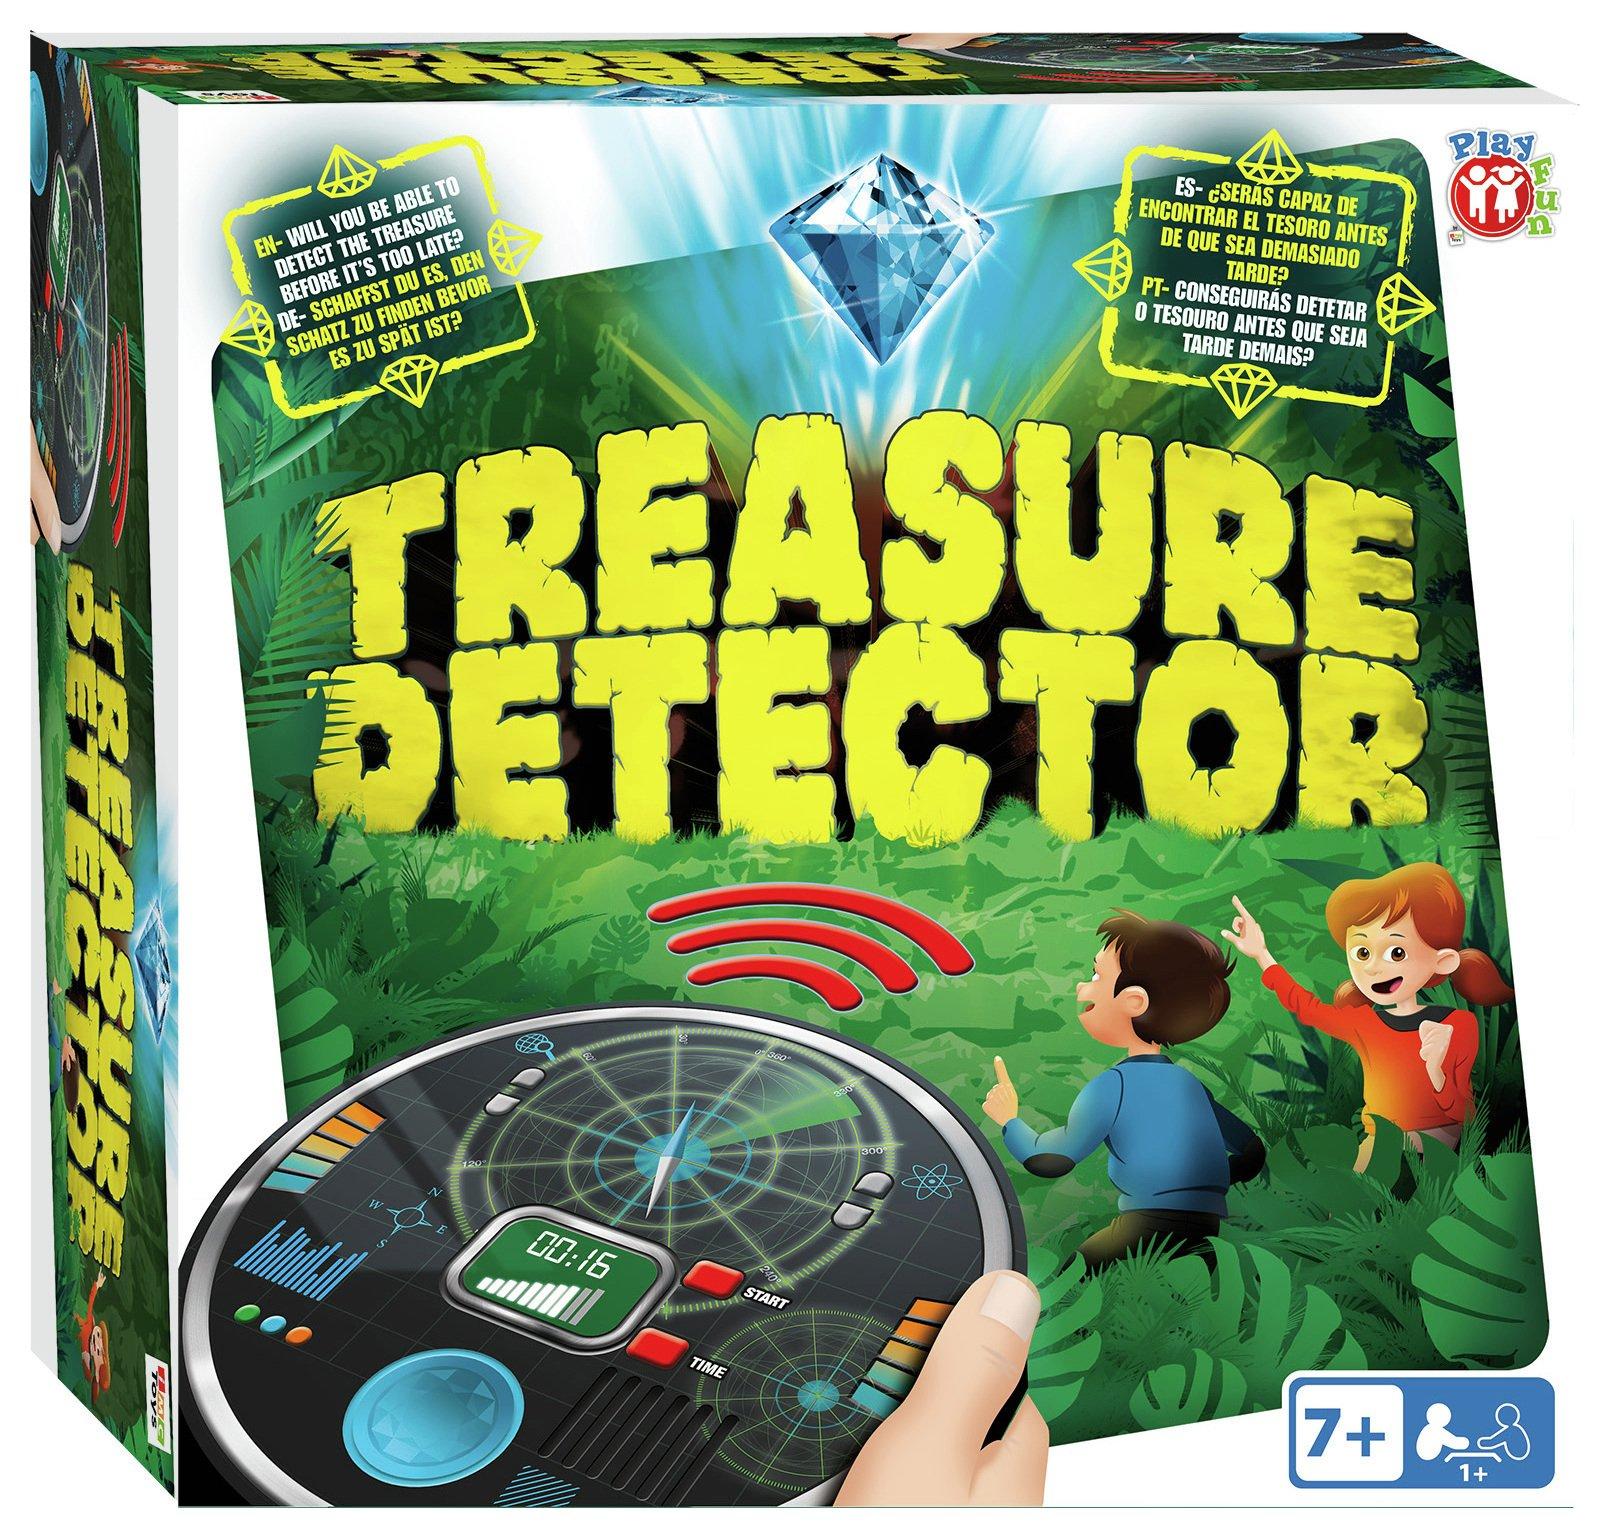 Treasure Detector.